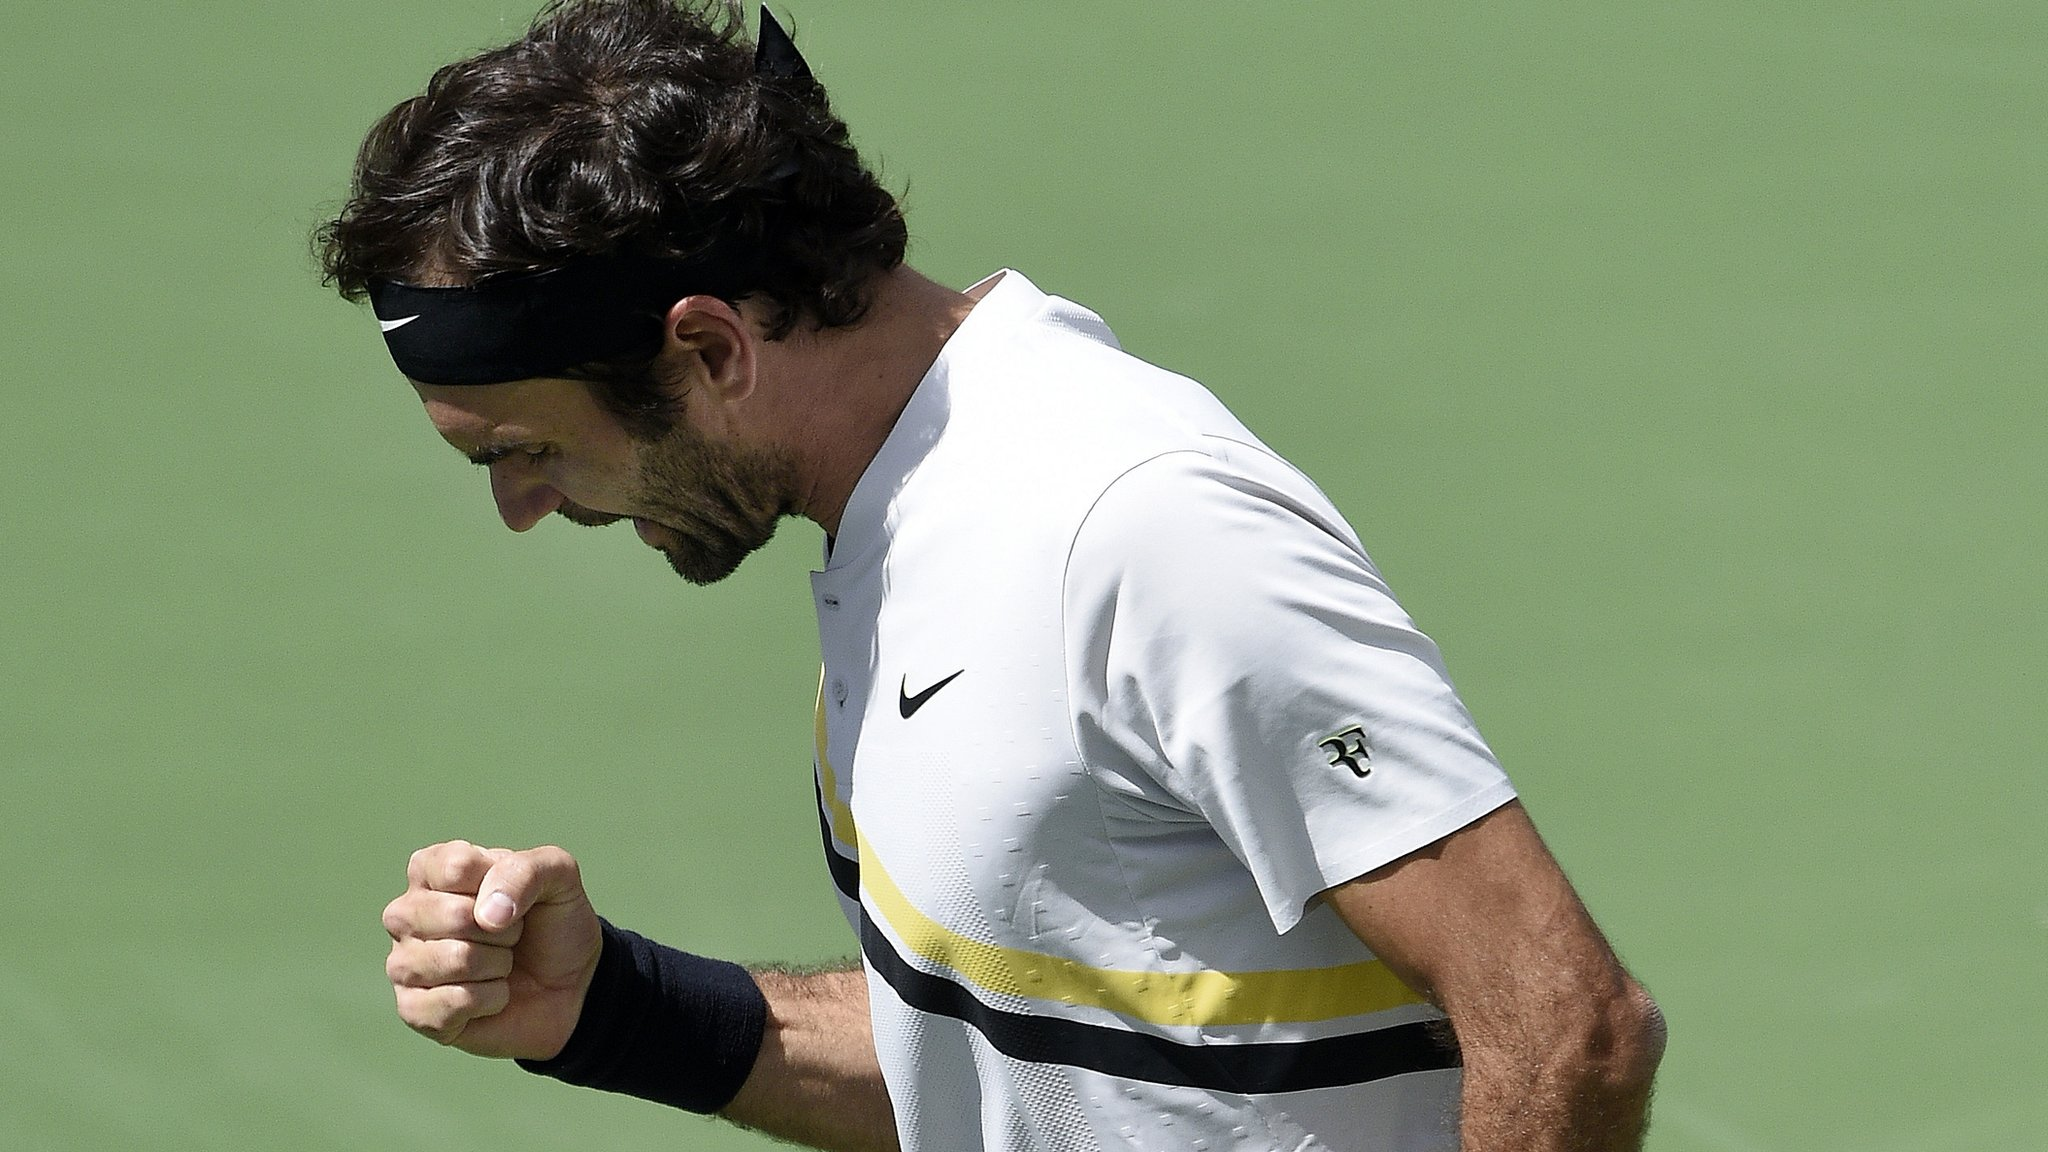 Federer makes best start to season to reach Indian Wells final